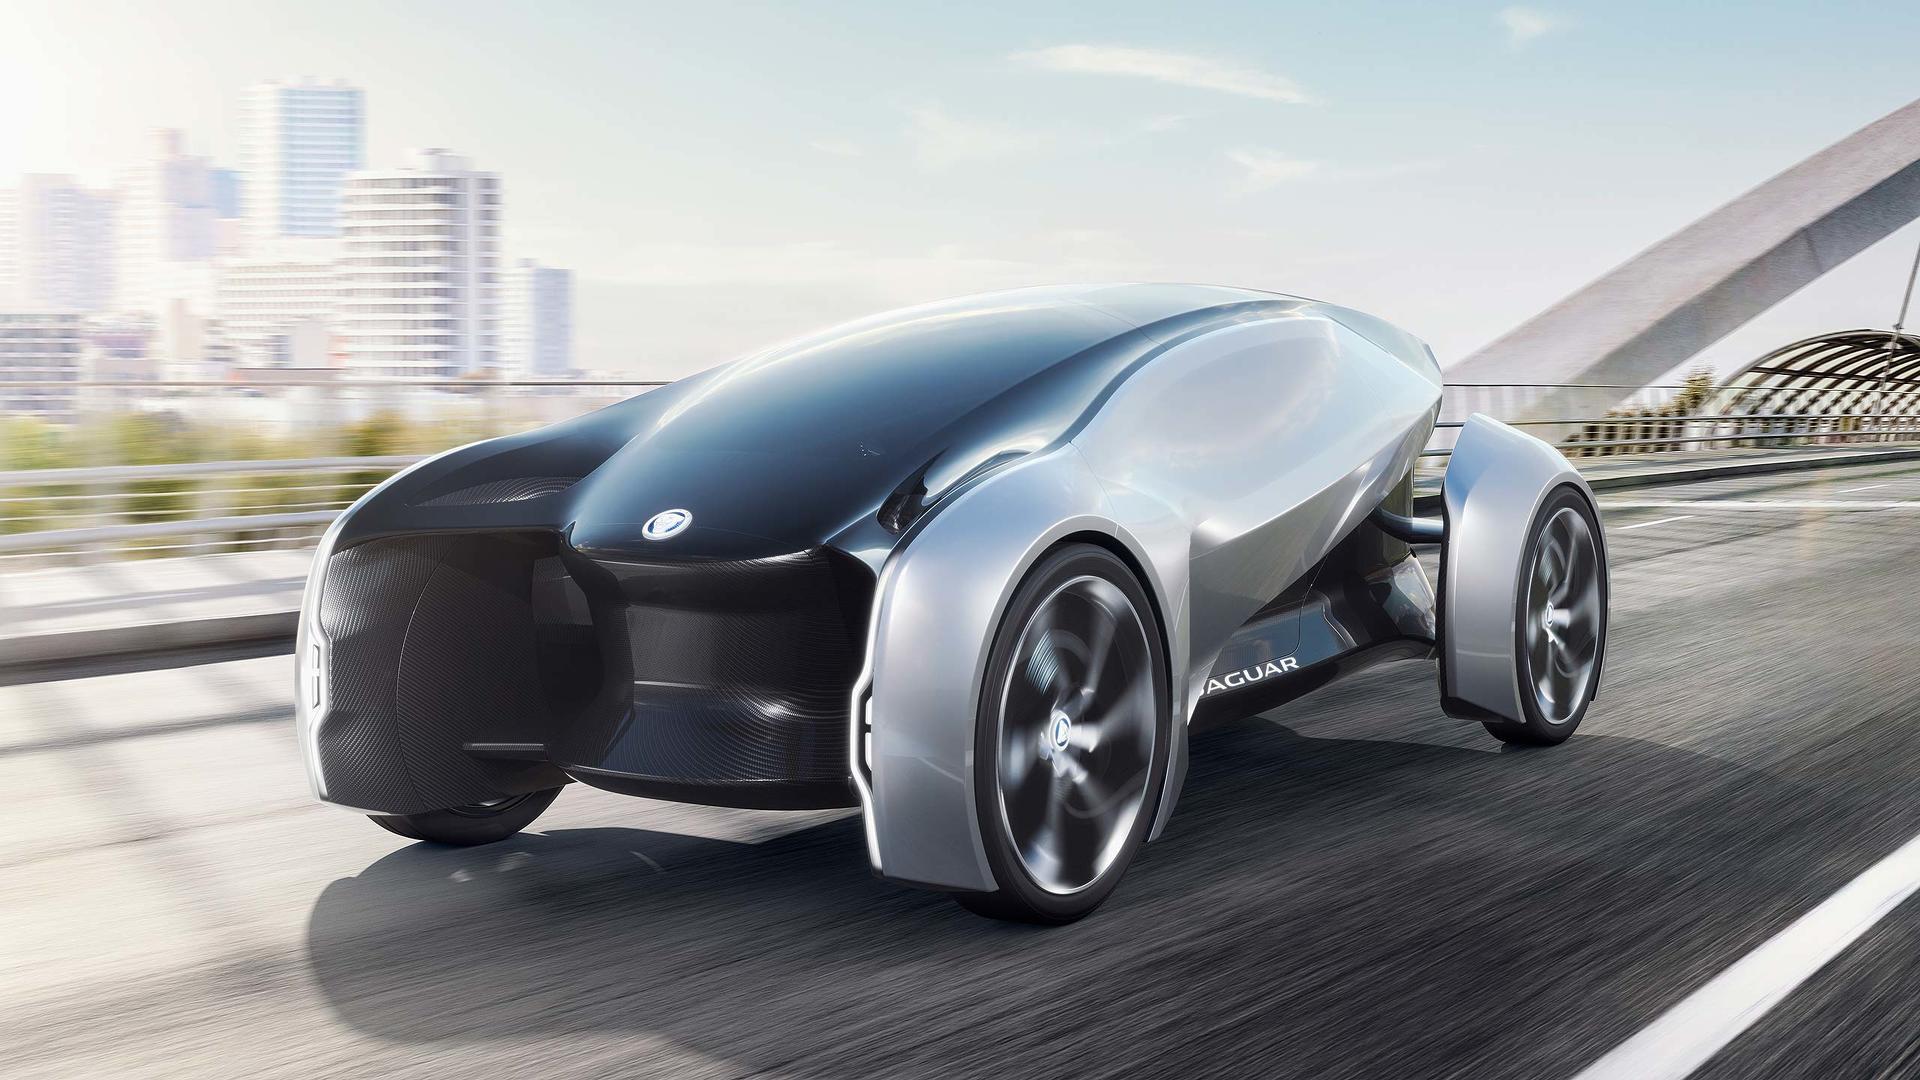 new w com will sv project hp url image wordpress the car hero s cars jaguar files drive xe cost jaguars q